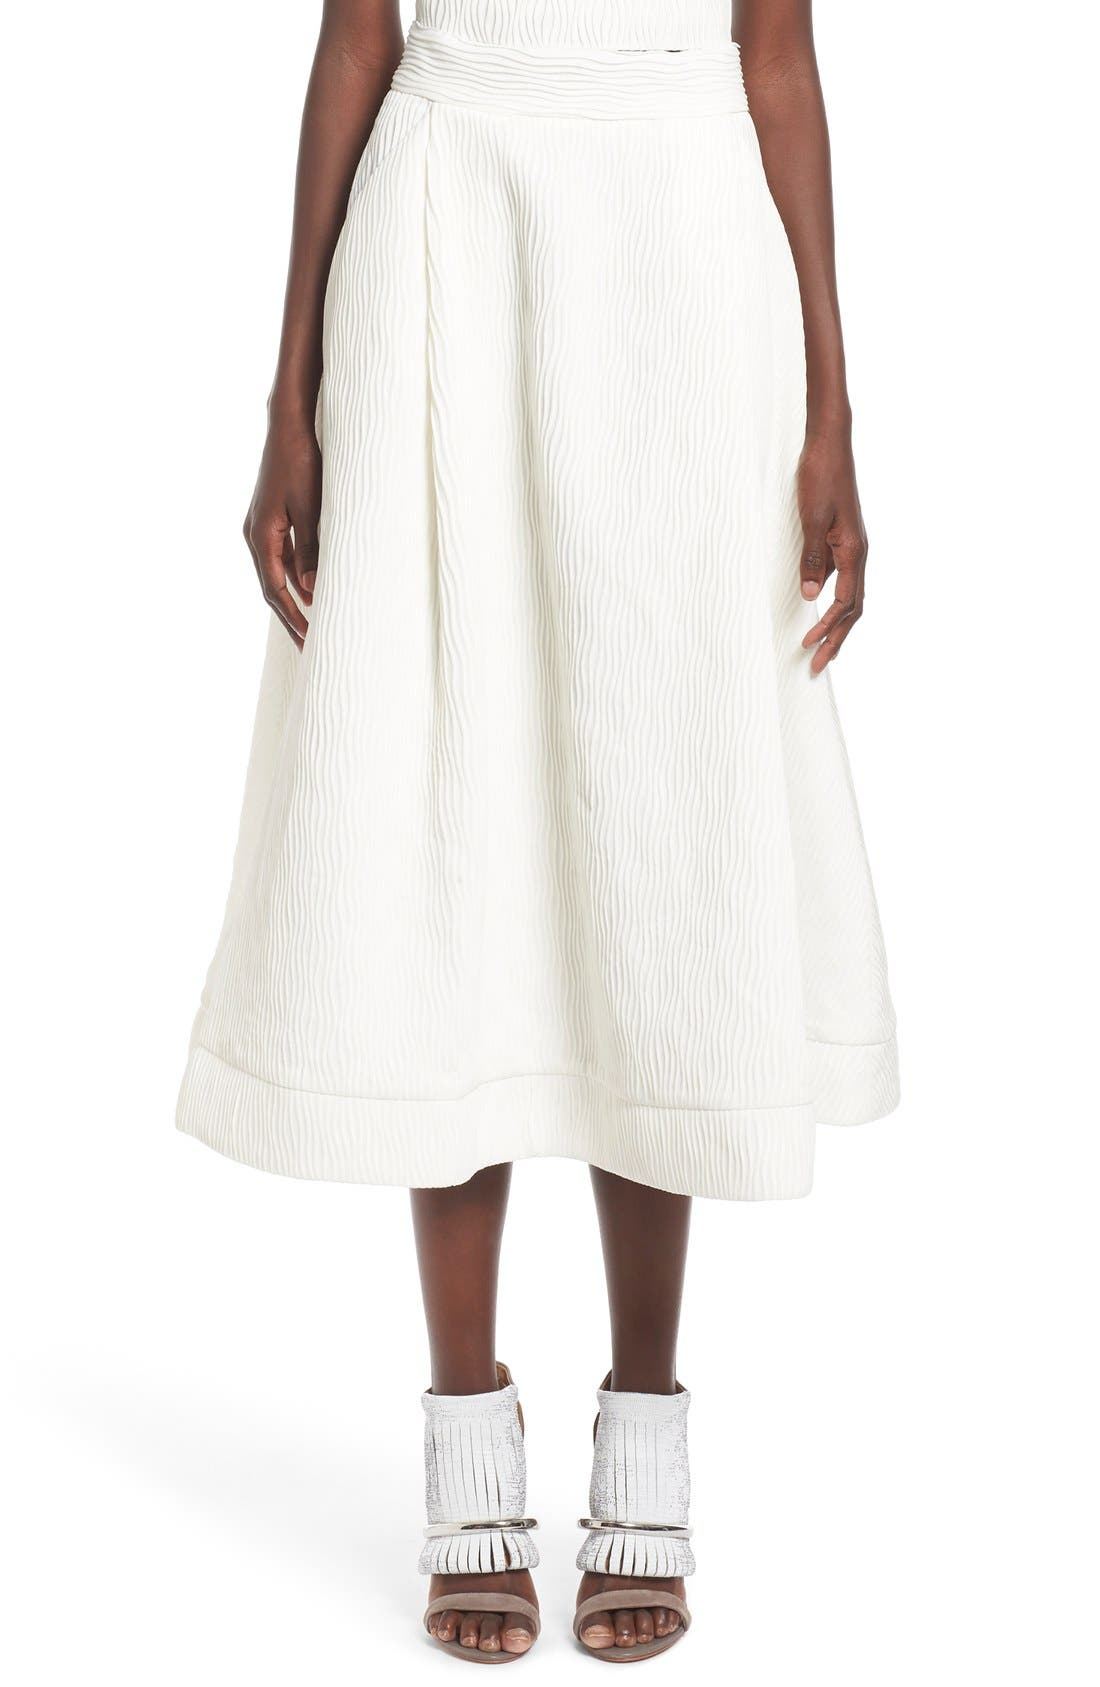 Main Image - C/MEO Collective 'Stay Close' Wavy Pleat Midi Skirt